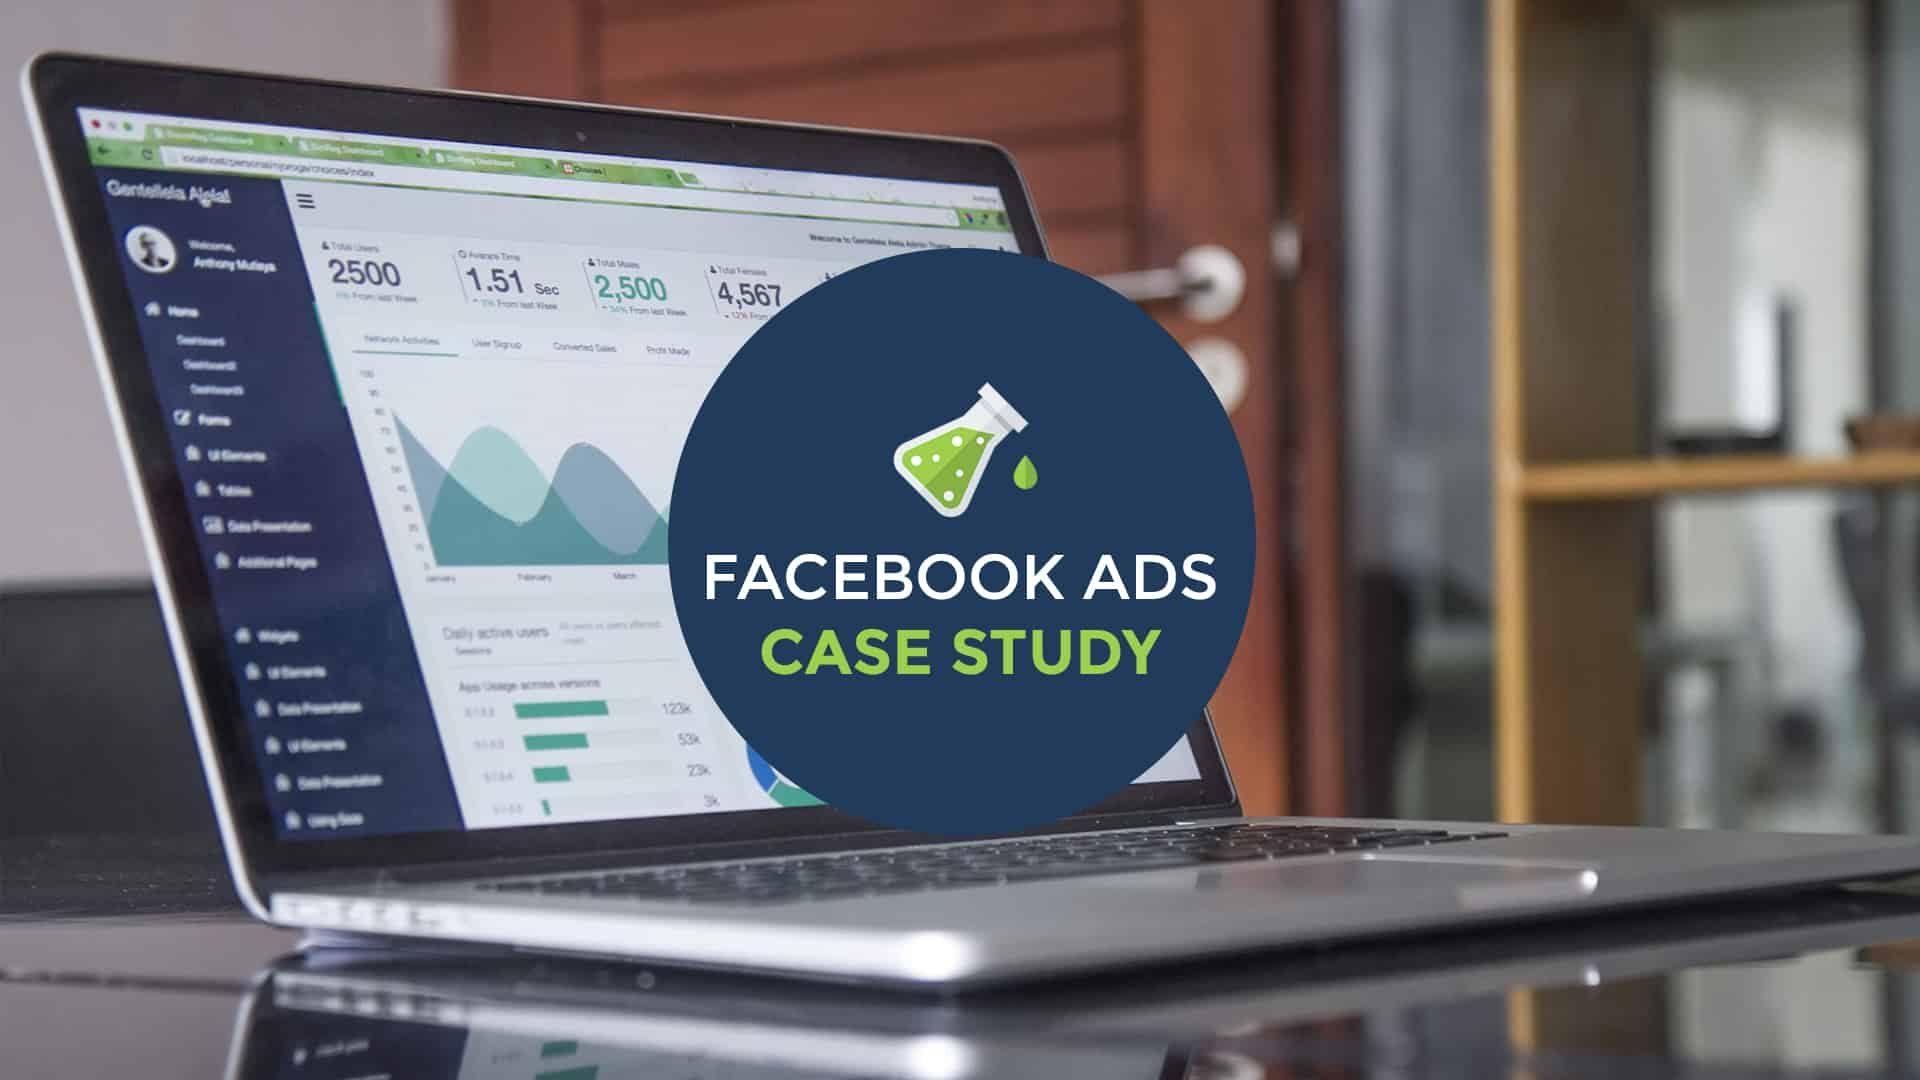 Facebook Ads Case Study